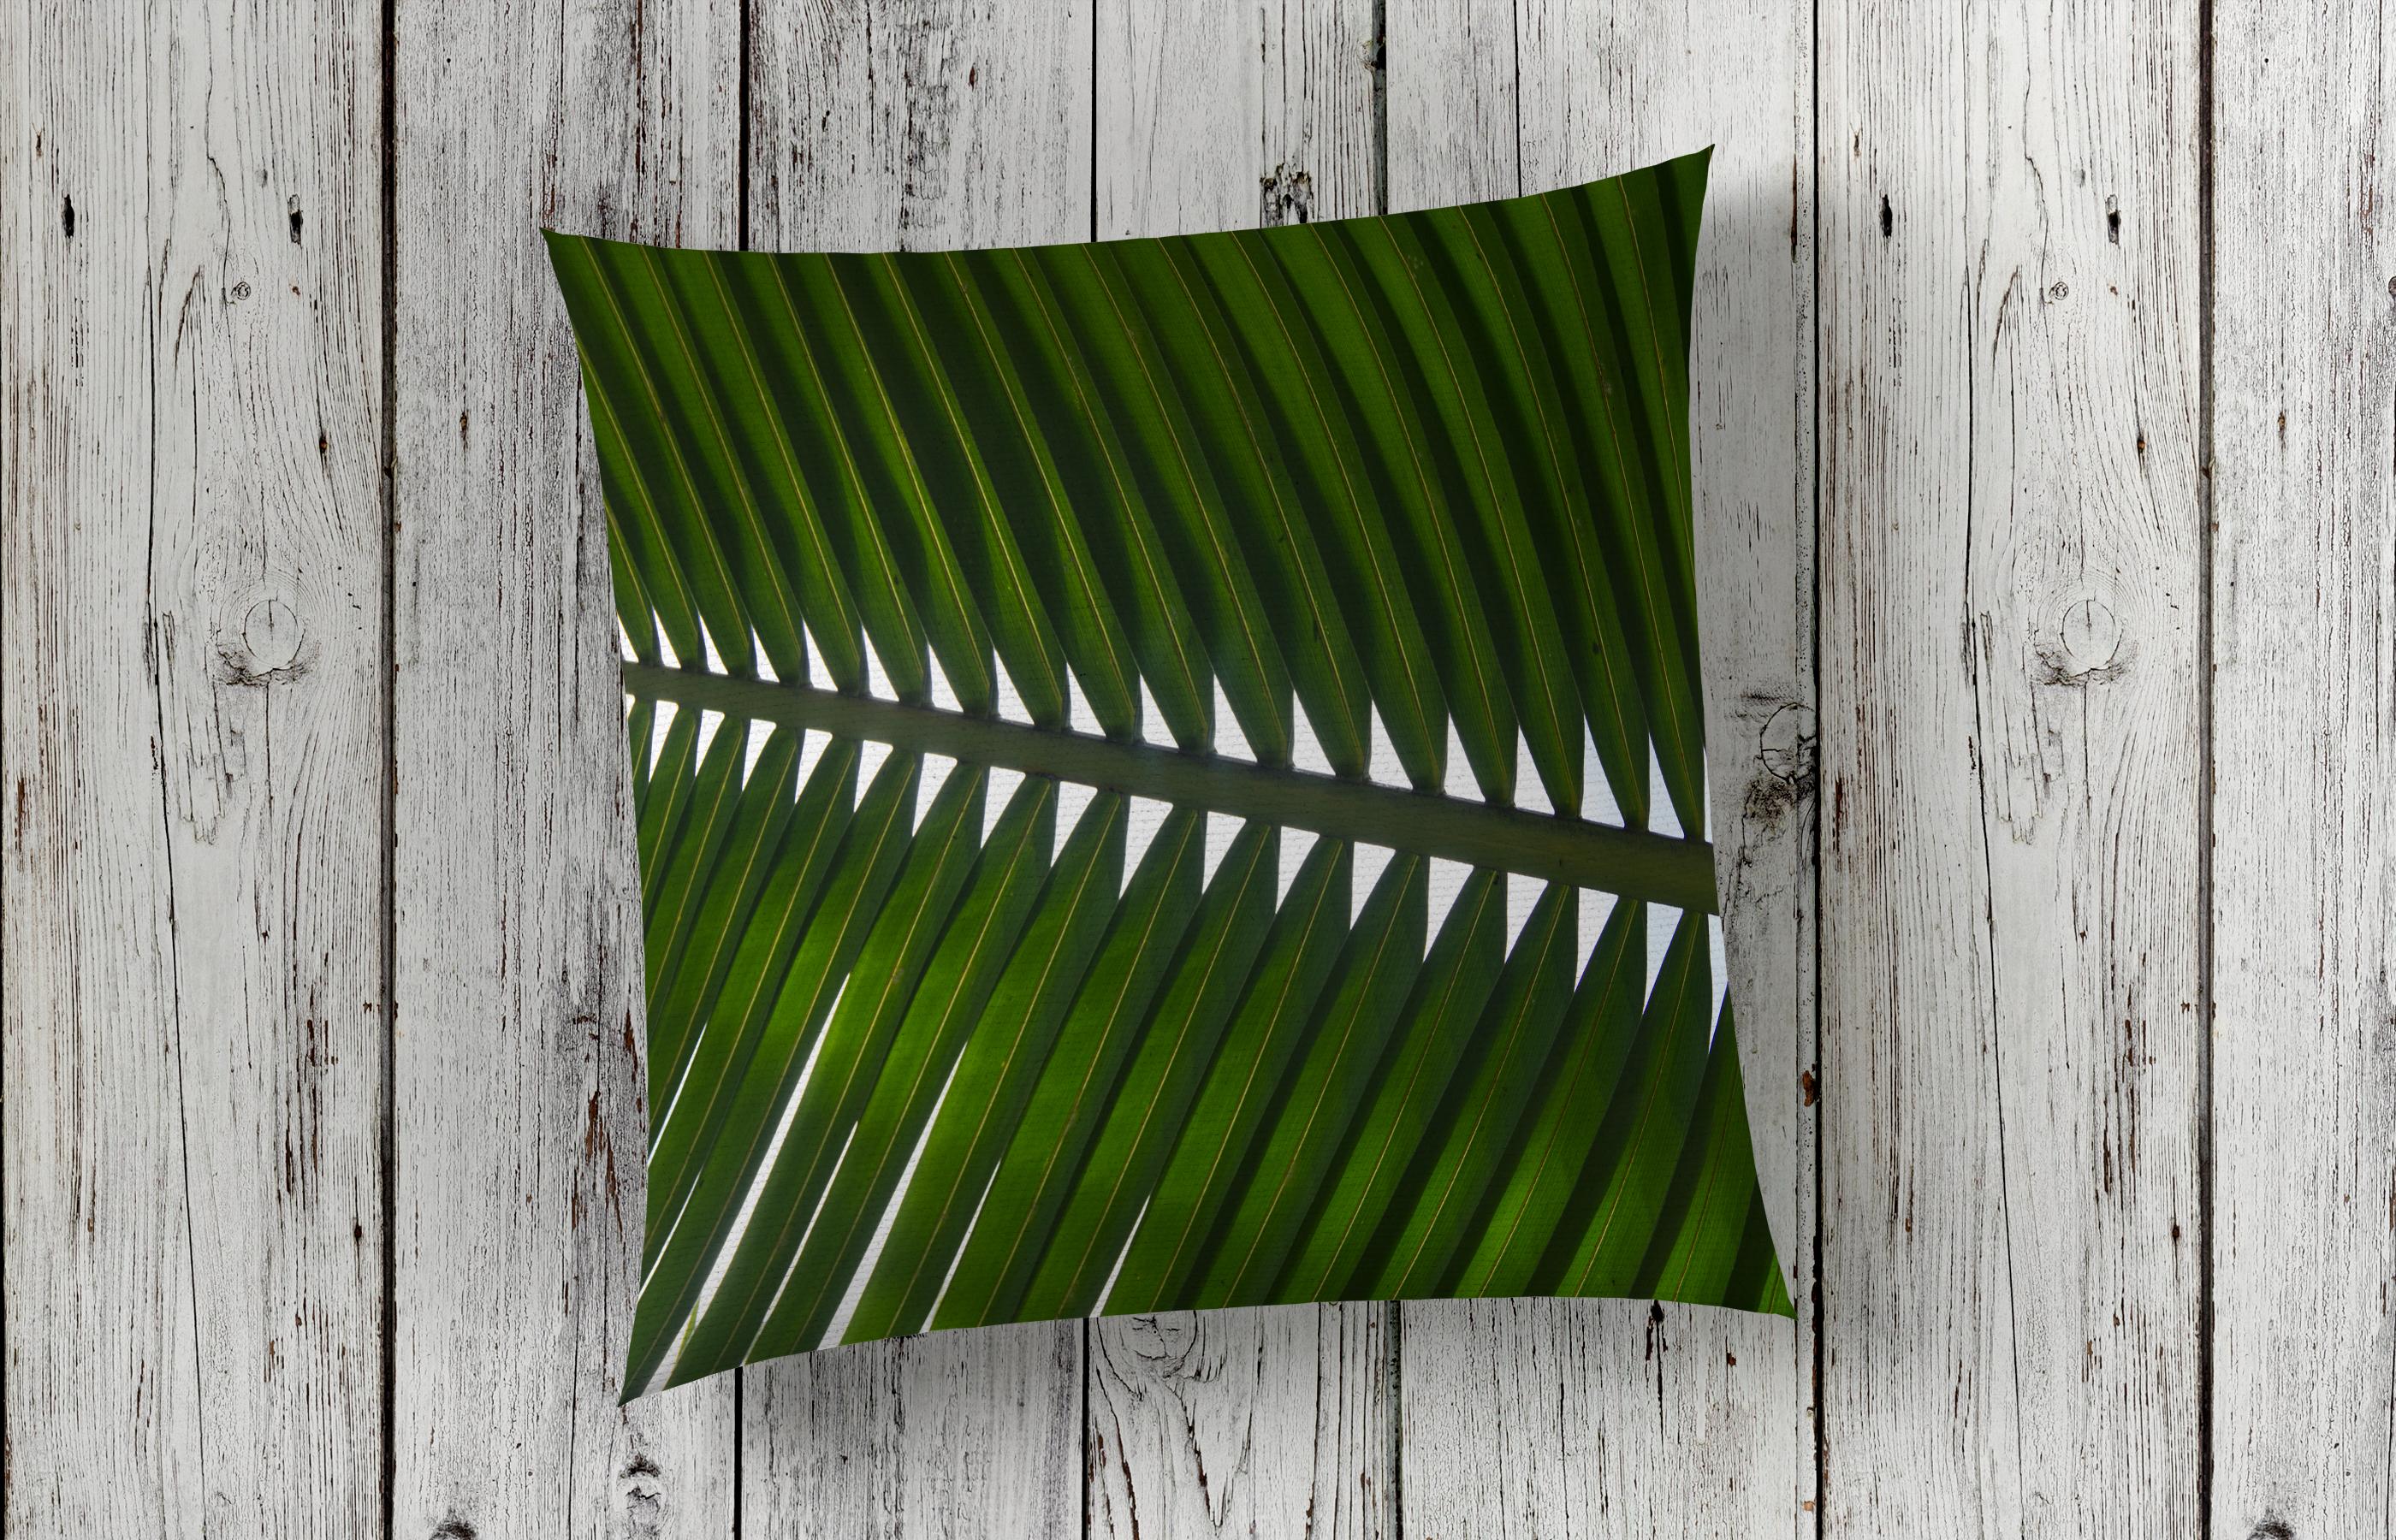 Single Palm Frond